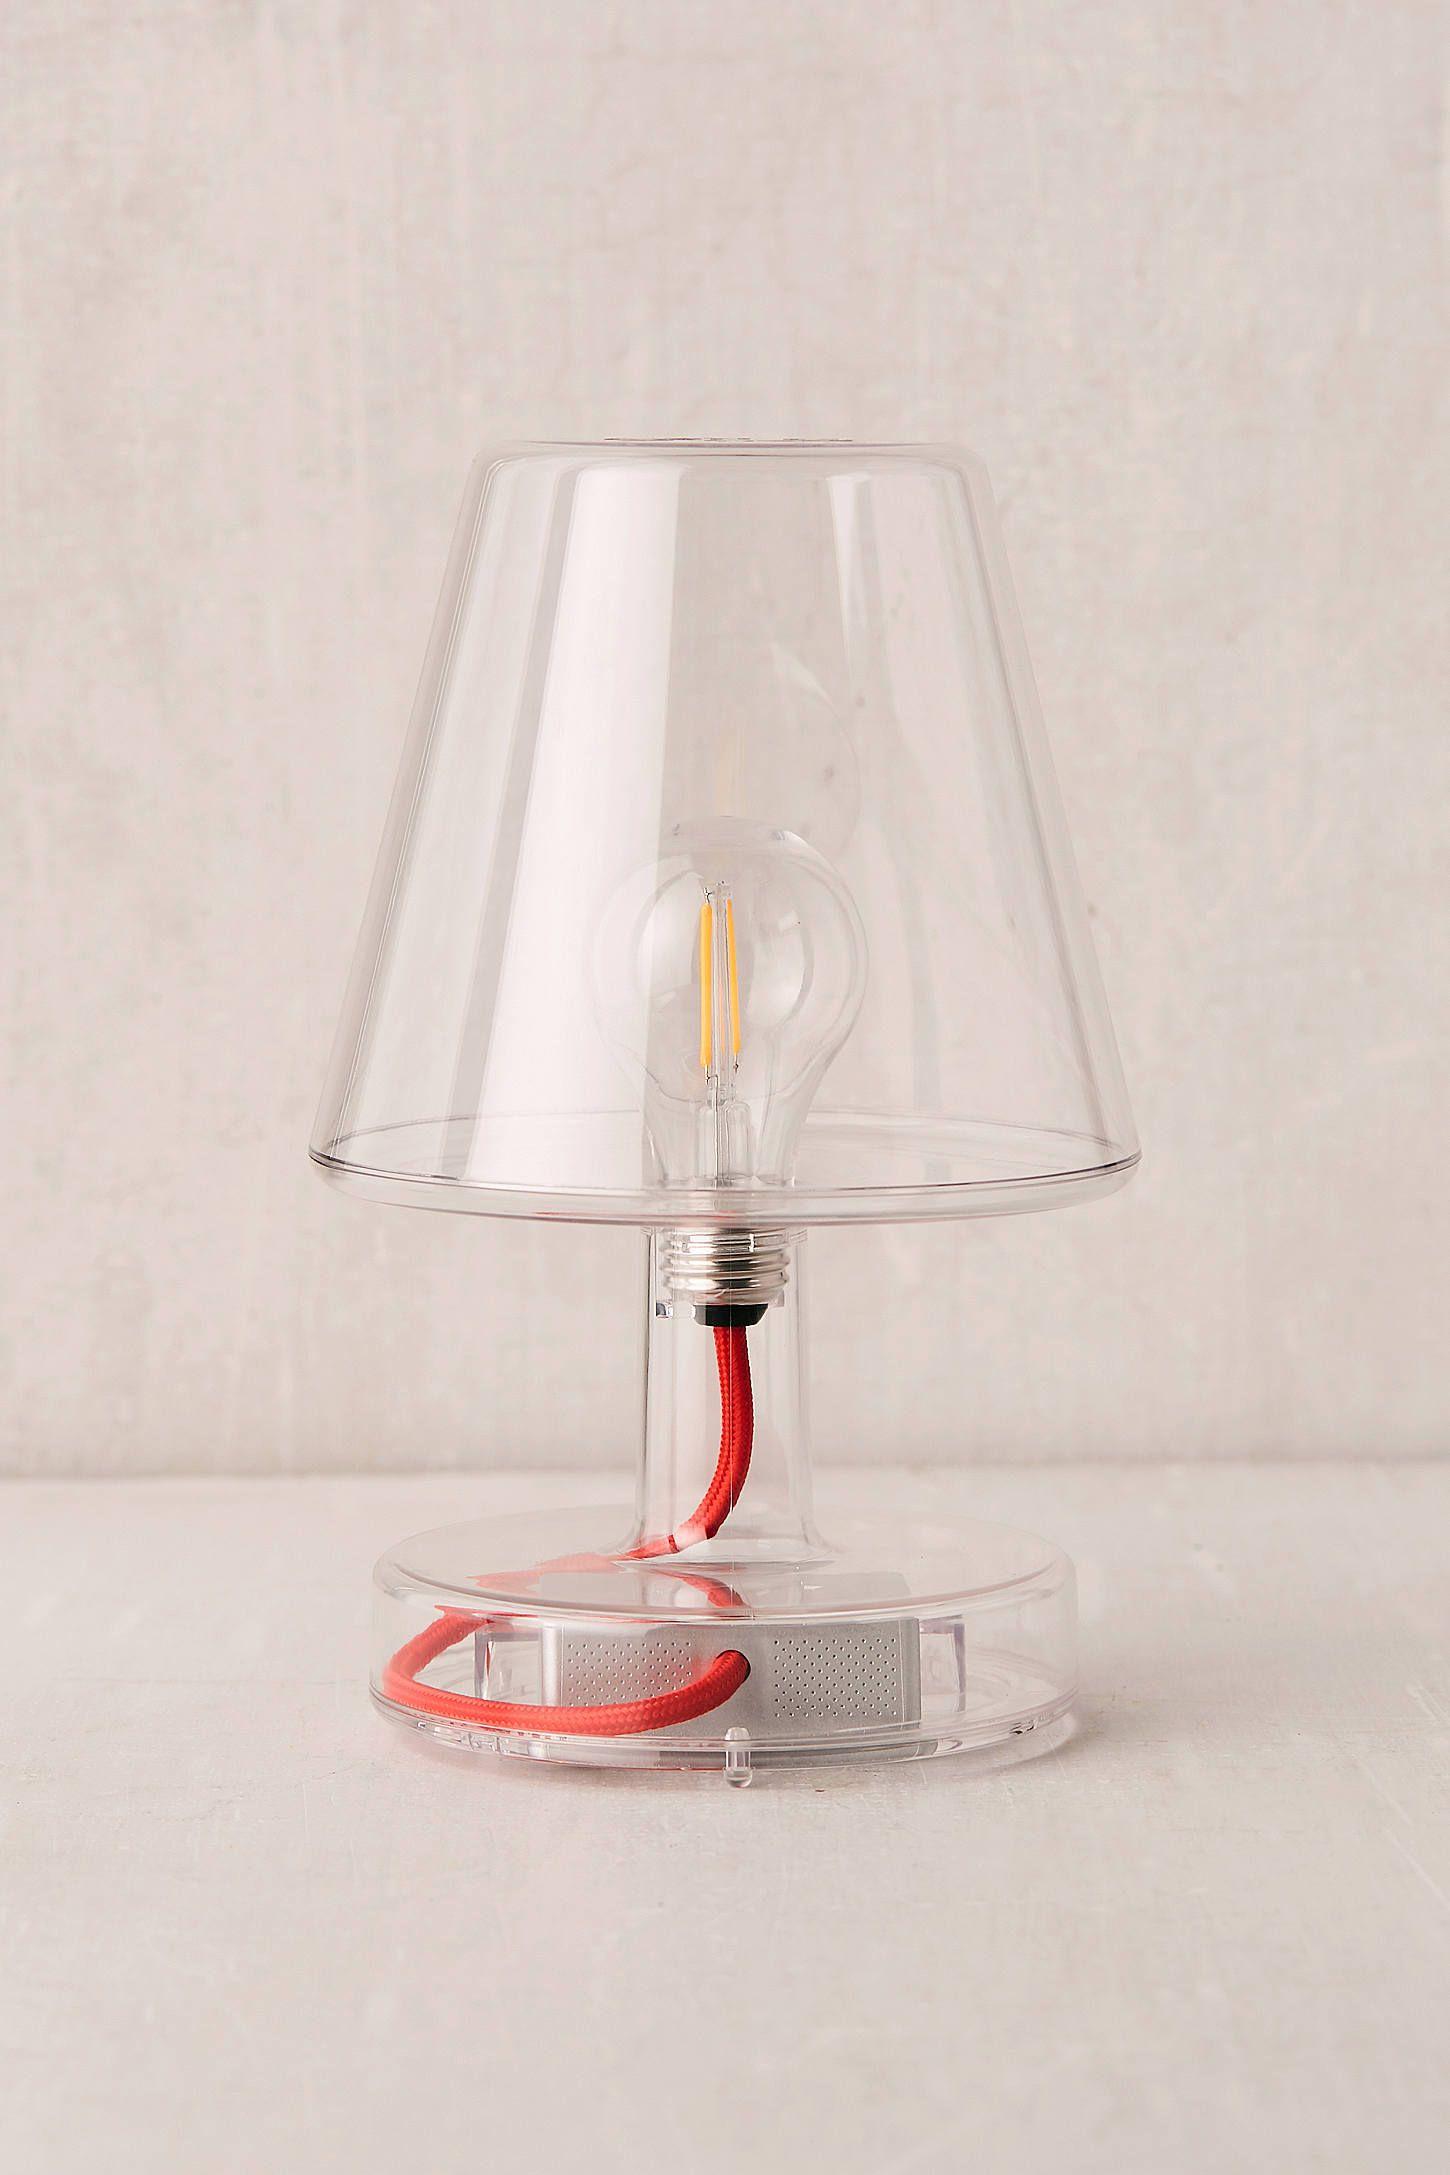 Fatboy Transloetje Table Lamp Table Lamp Lamp Novelty Lamp